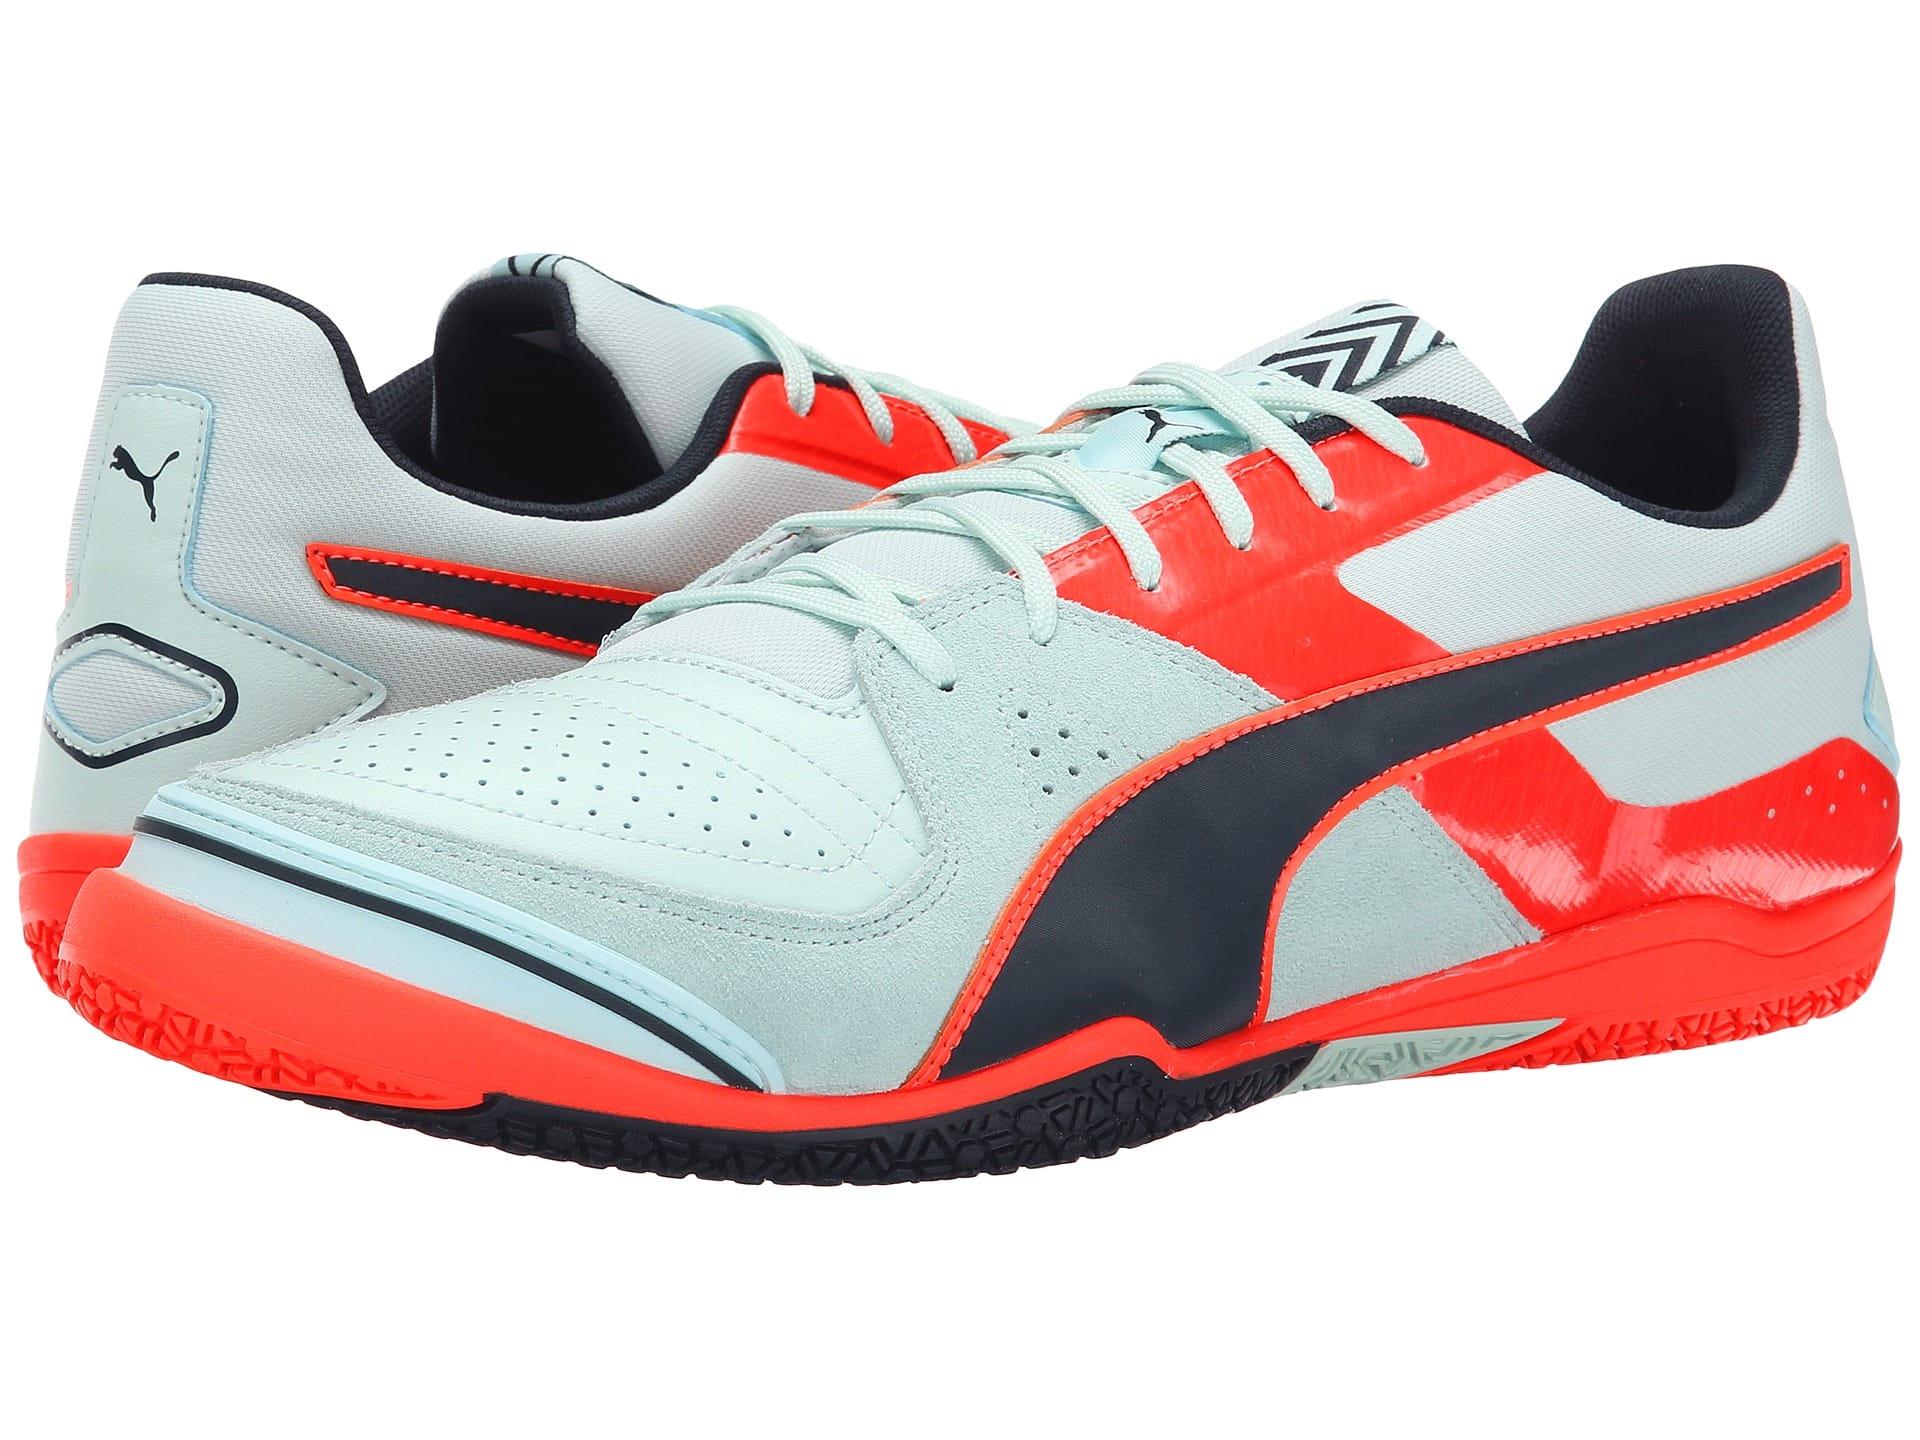 chaussures-futsal-puma-invicto-sala